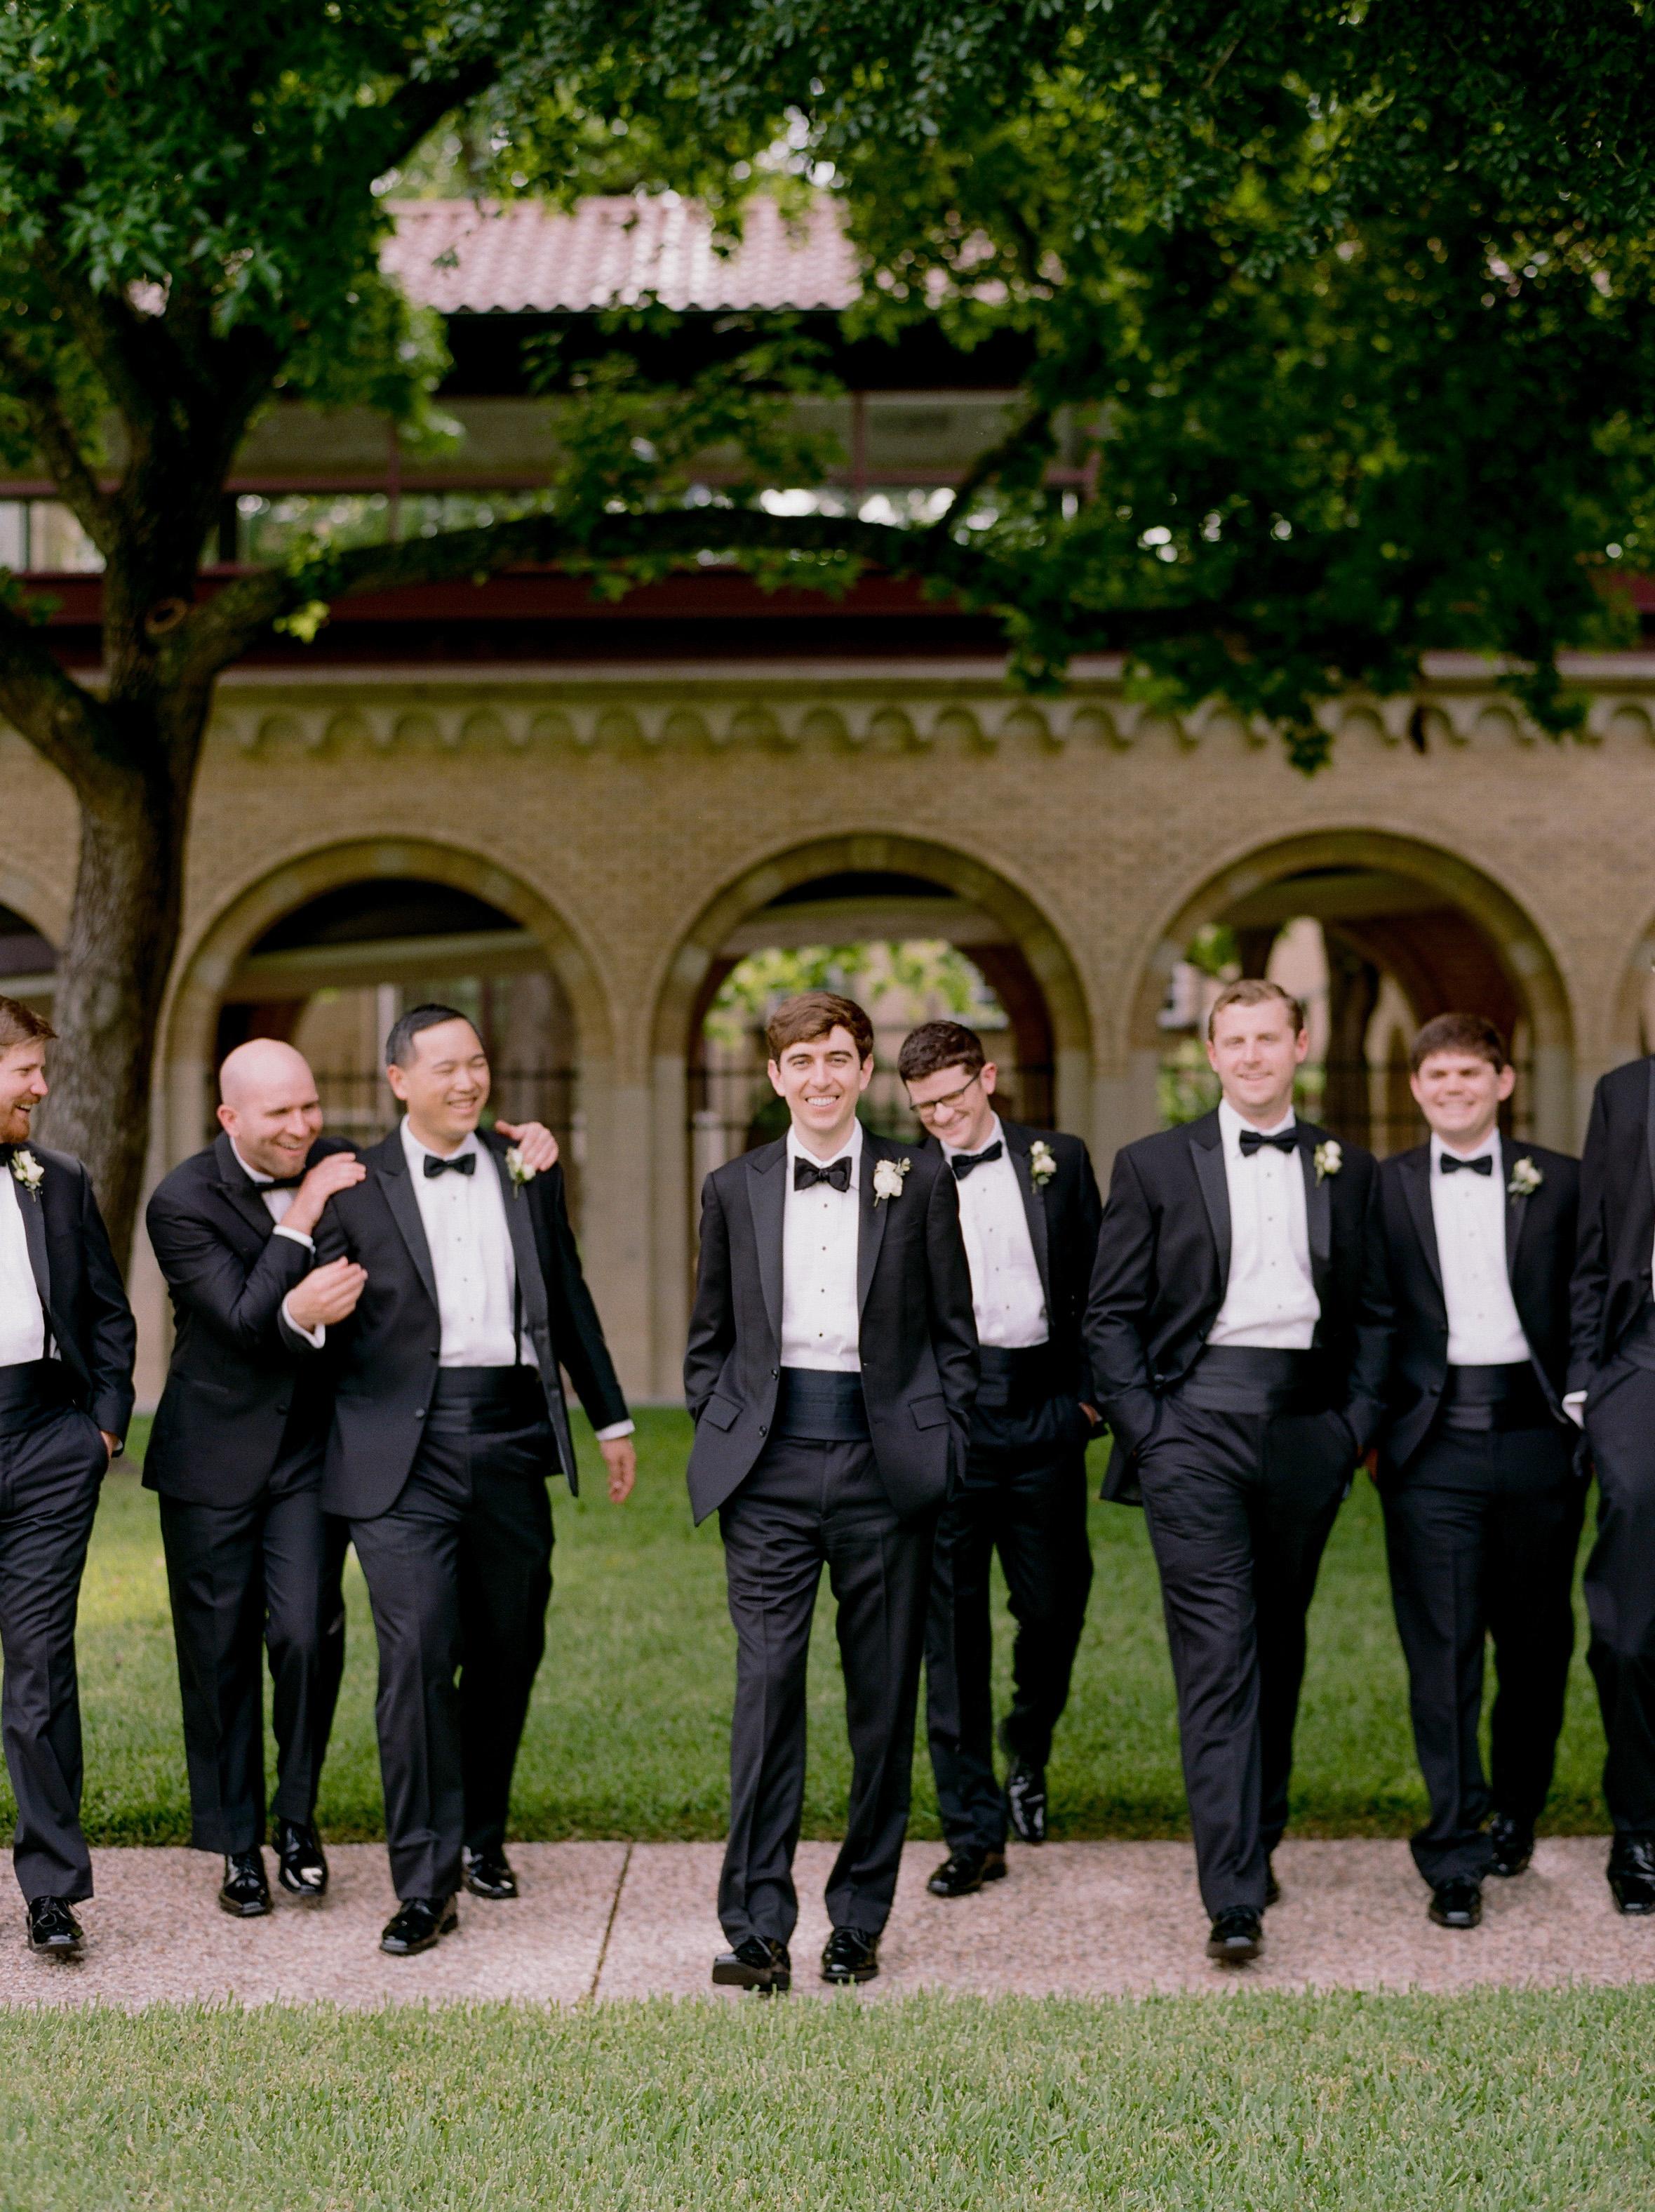 Fine-Art-Film-Houston-Wedding-Photographer-Best-Top-Luxury-Texas-Austin-Dallas-Destination-Dana-Fernandez-Photography-River-Oaks-Country-Club-South-Main-Baptist-Ceremony-Reception-Wedding-26.jpg